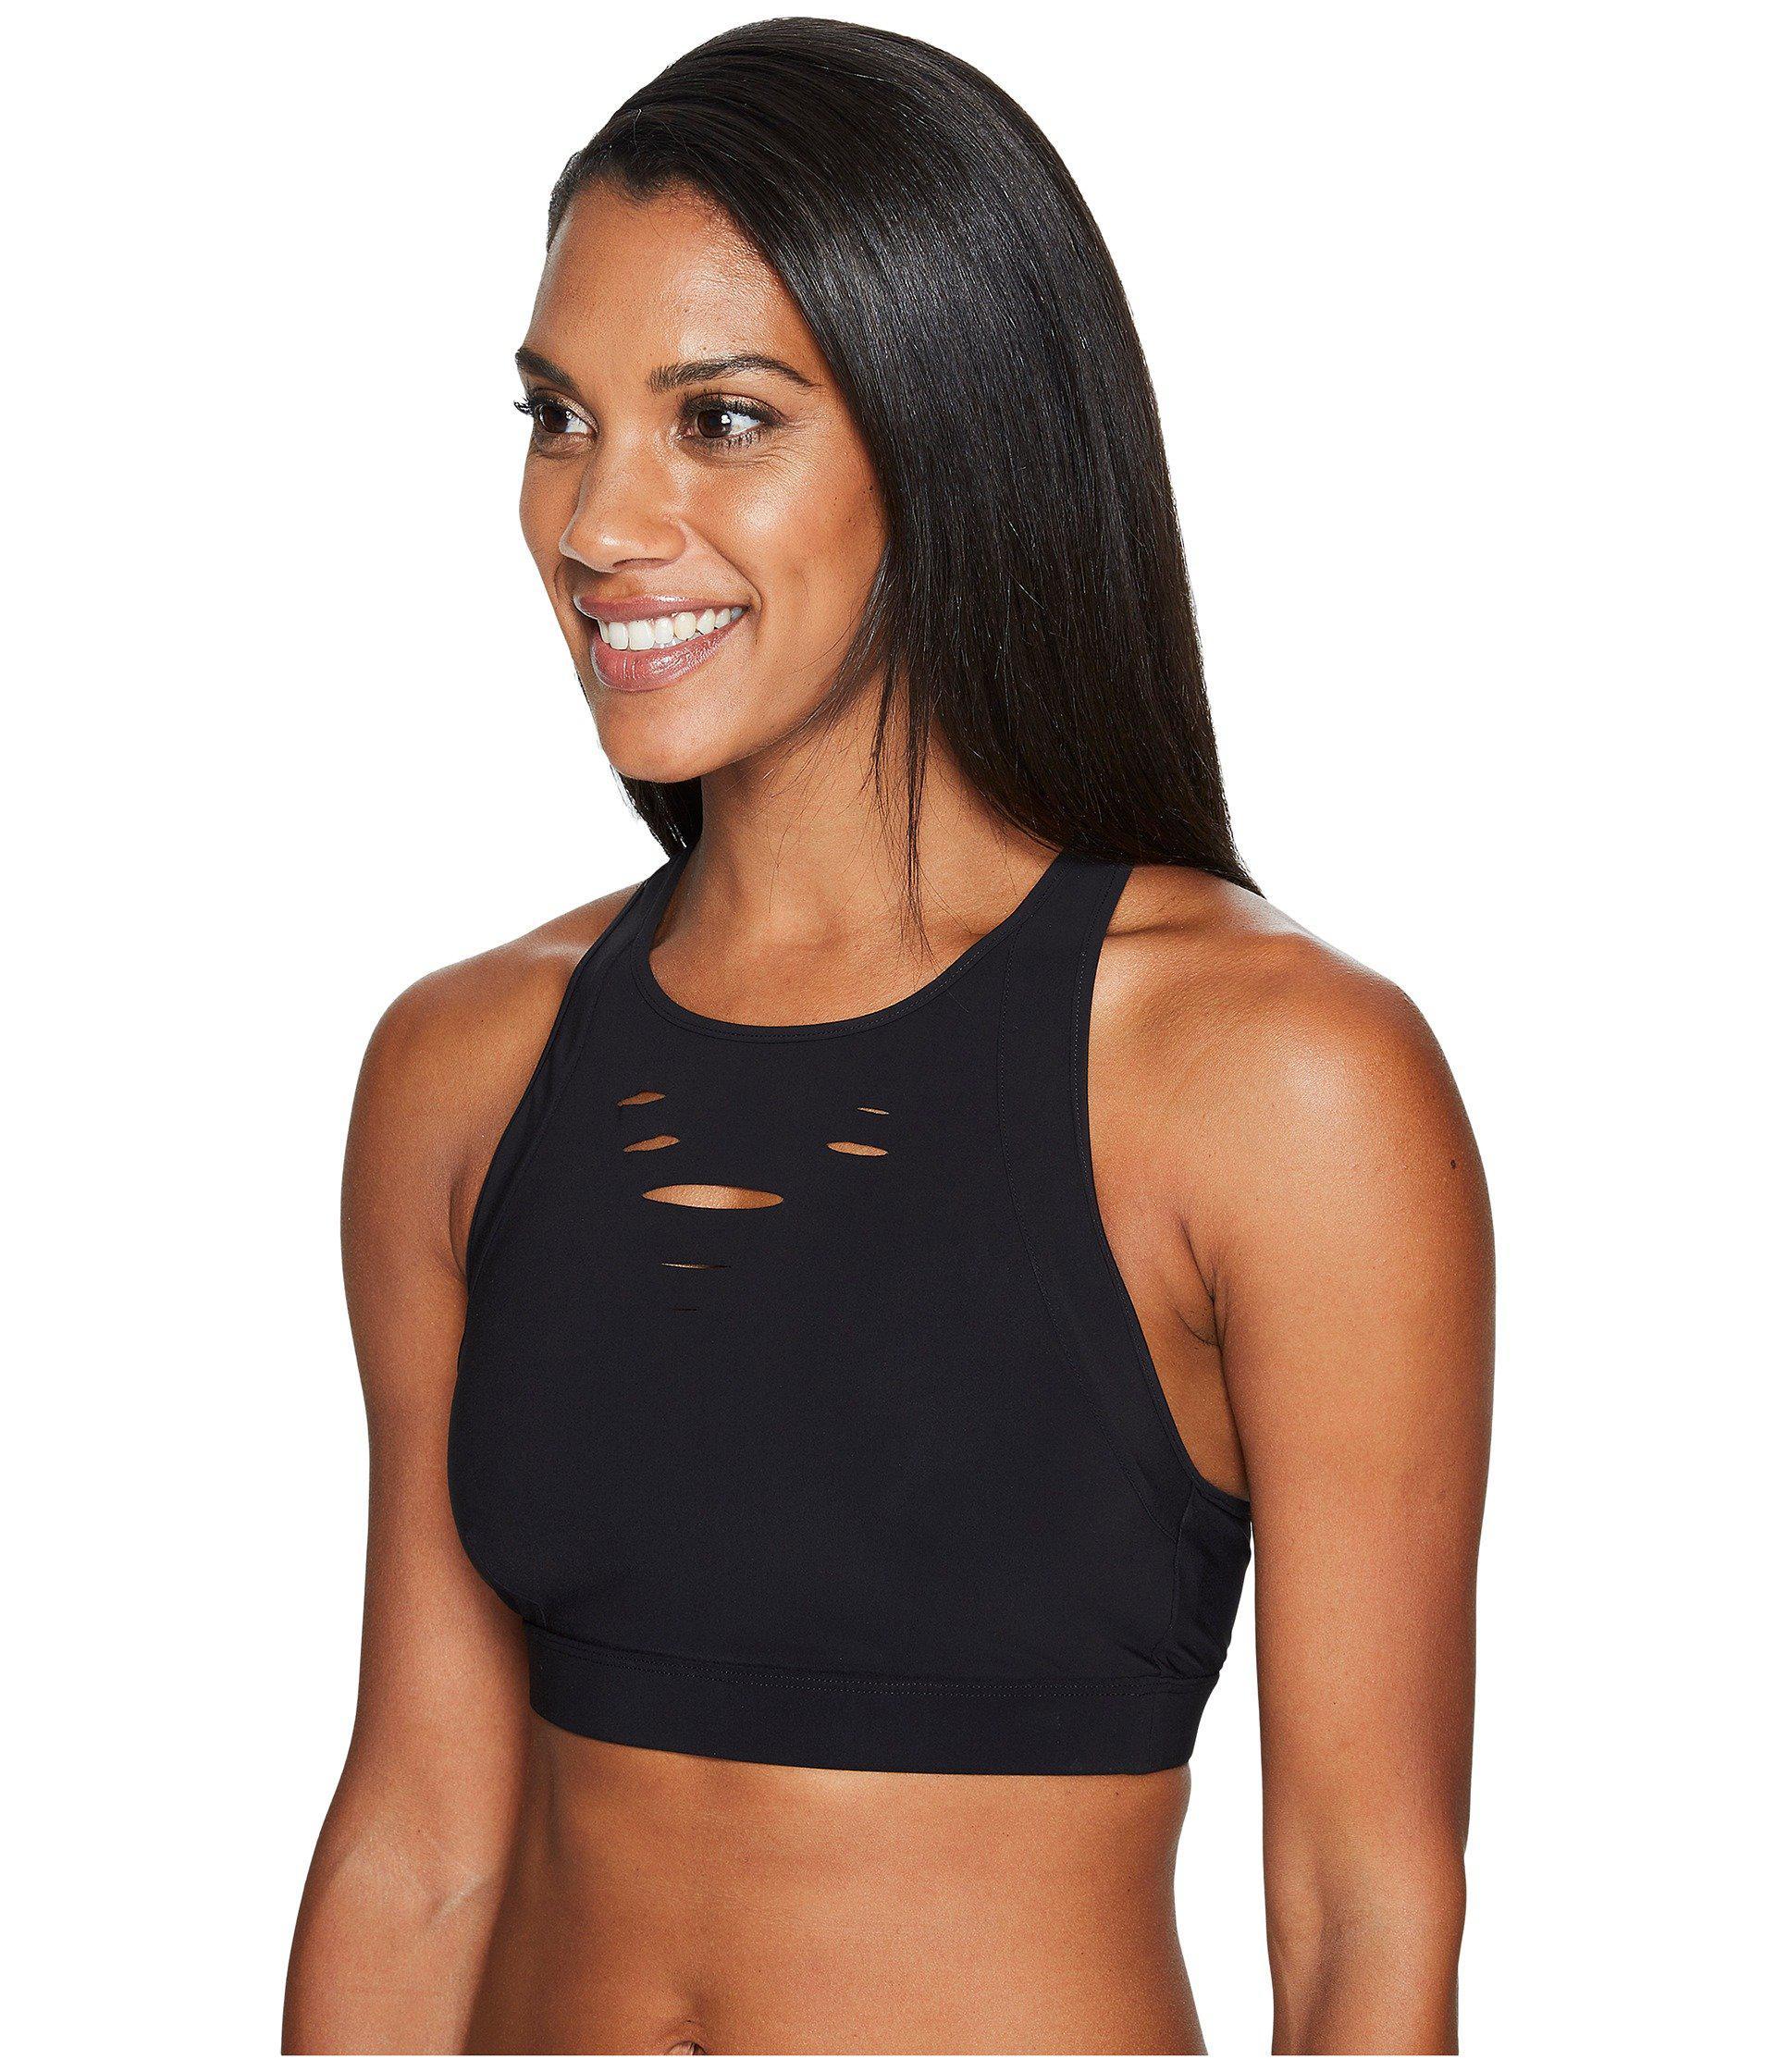 4eabbbfe967dc Lyst - Alo Yoga Ripped Warrior Bra (black) Women s Bra in Black